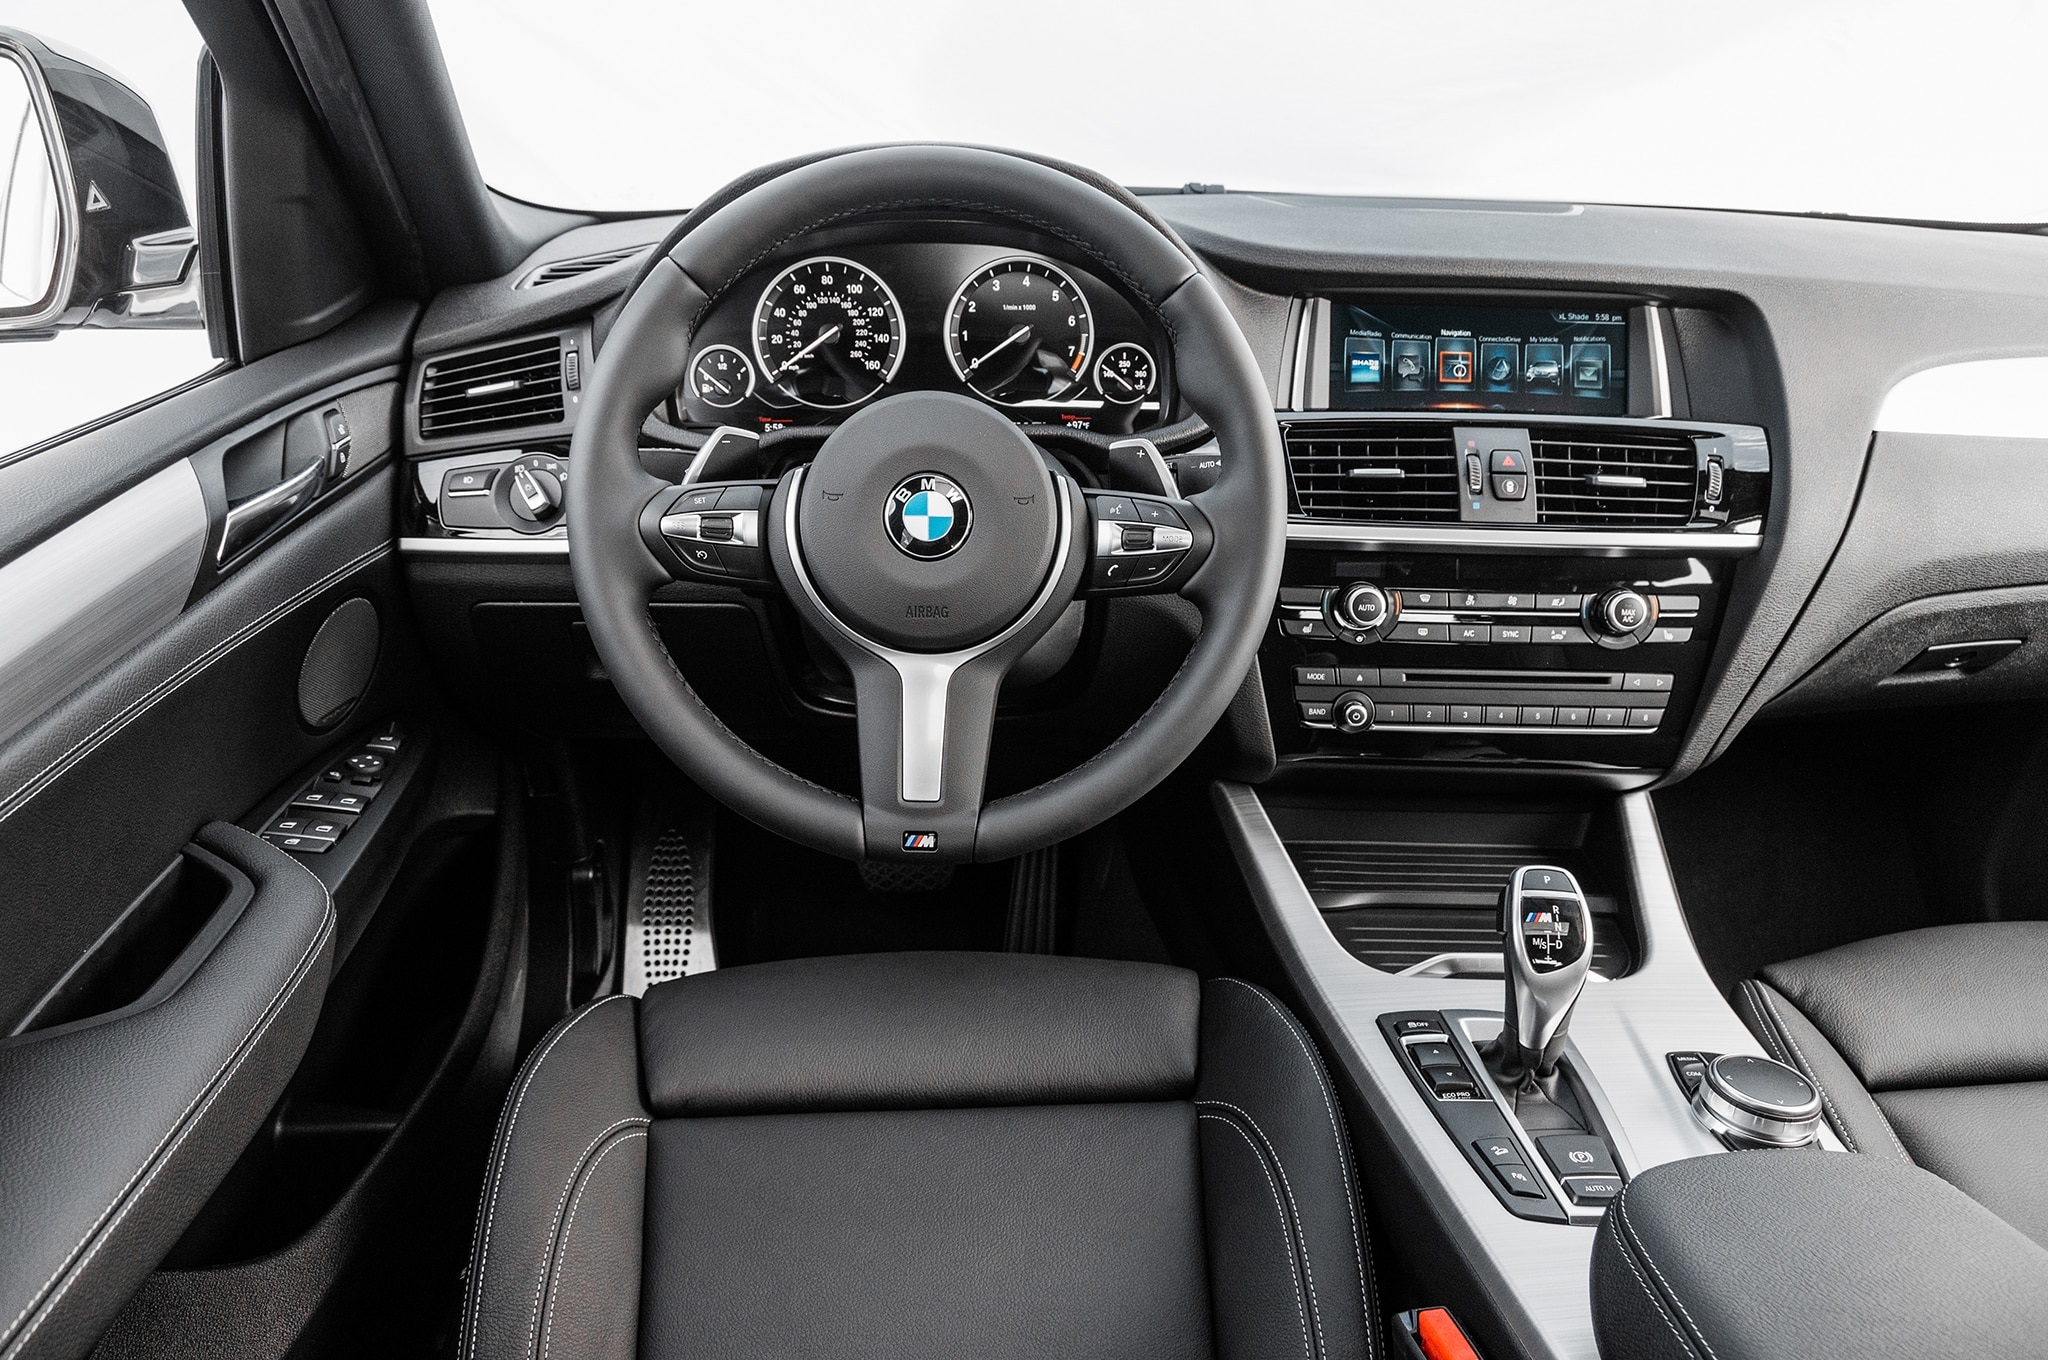 2018 Bmw X4 Xdrive28i Interior Motor Trend En Espa 241 Ol